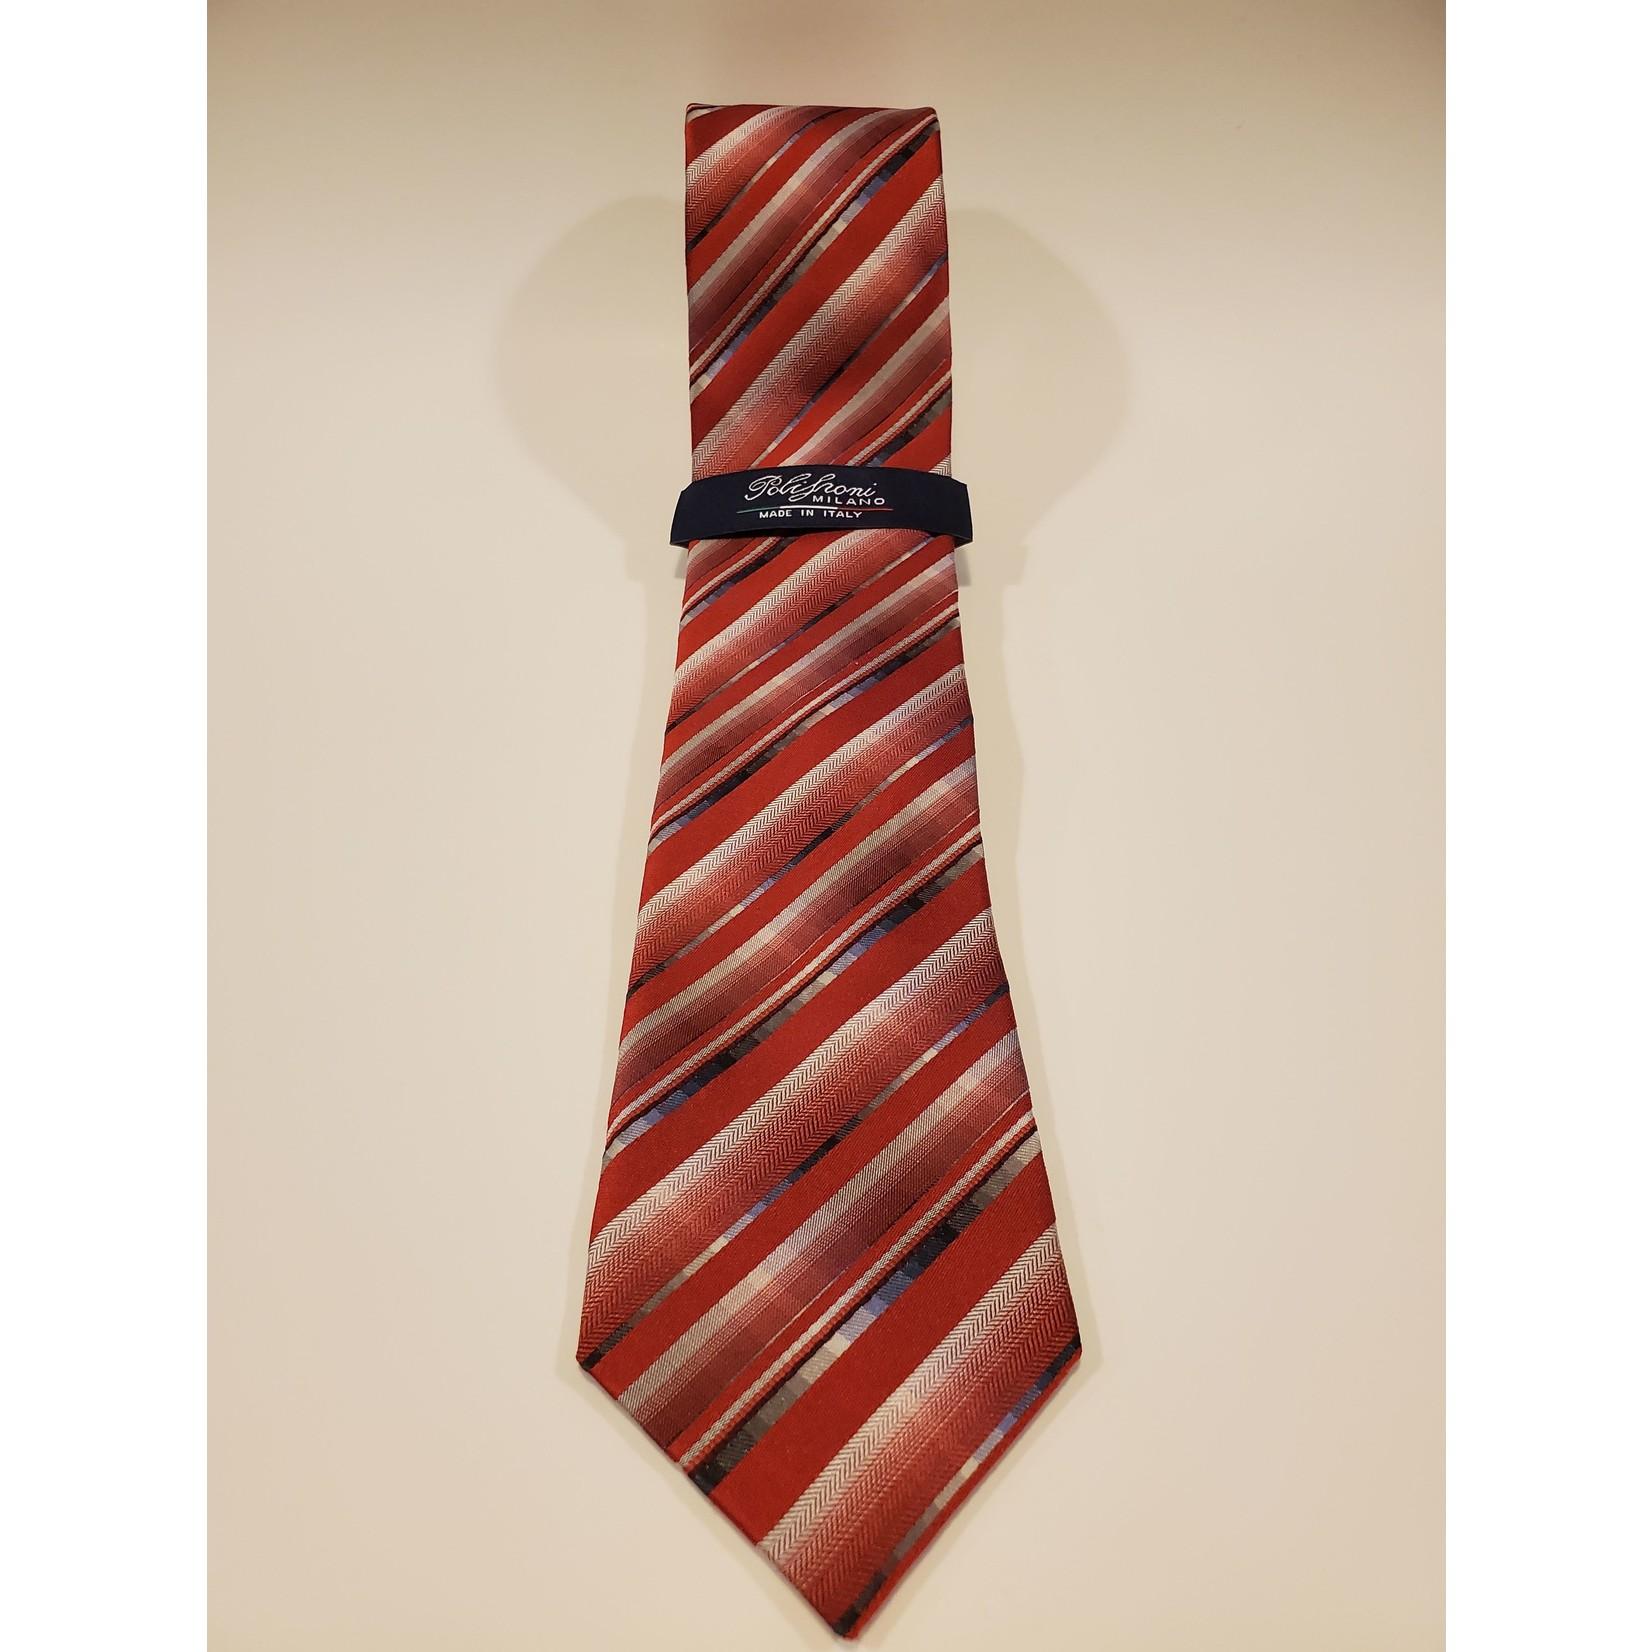 Polifroni Polifroni 211906 Jacquard Striped Silk Tie